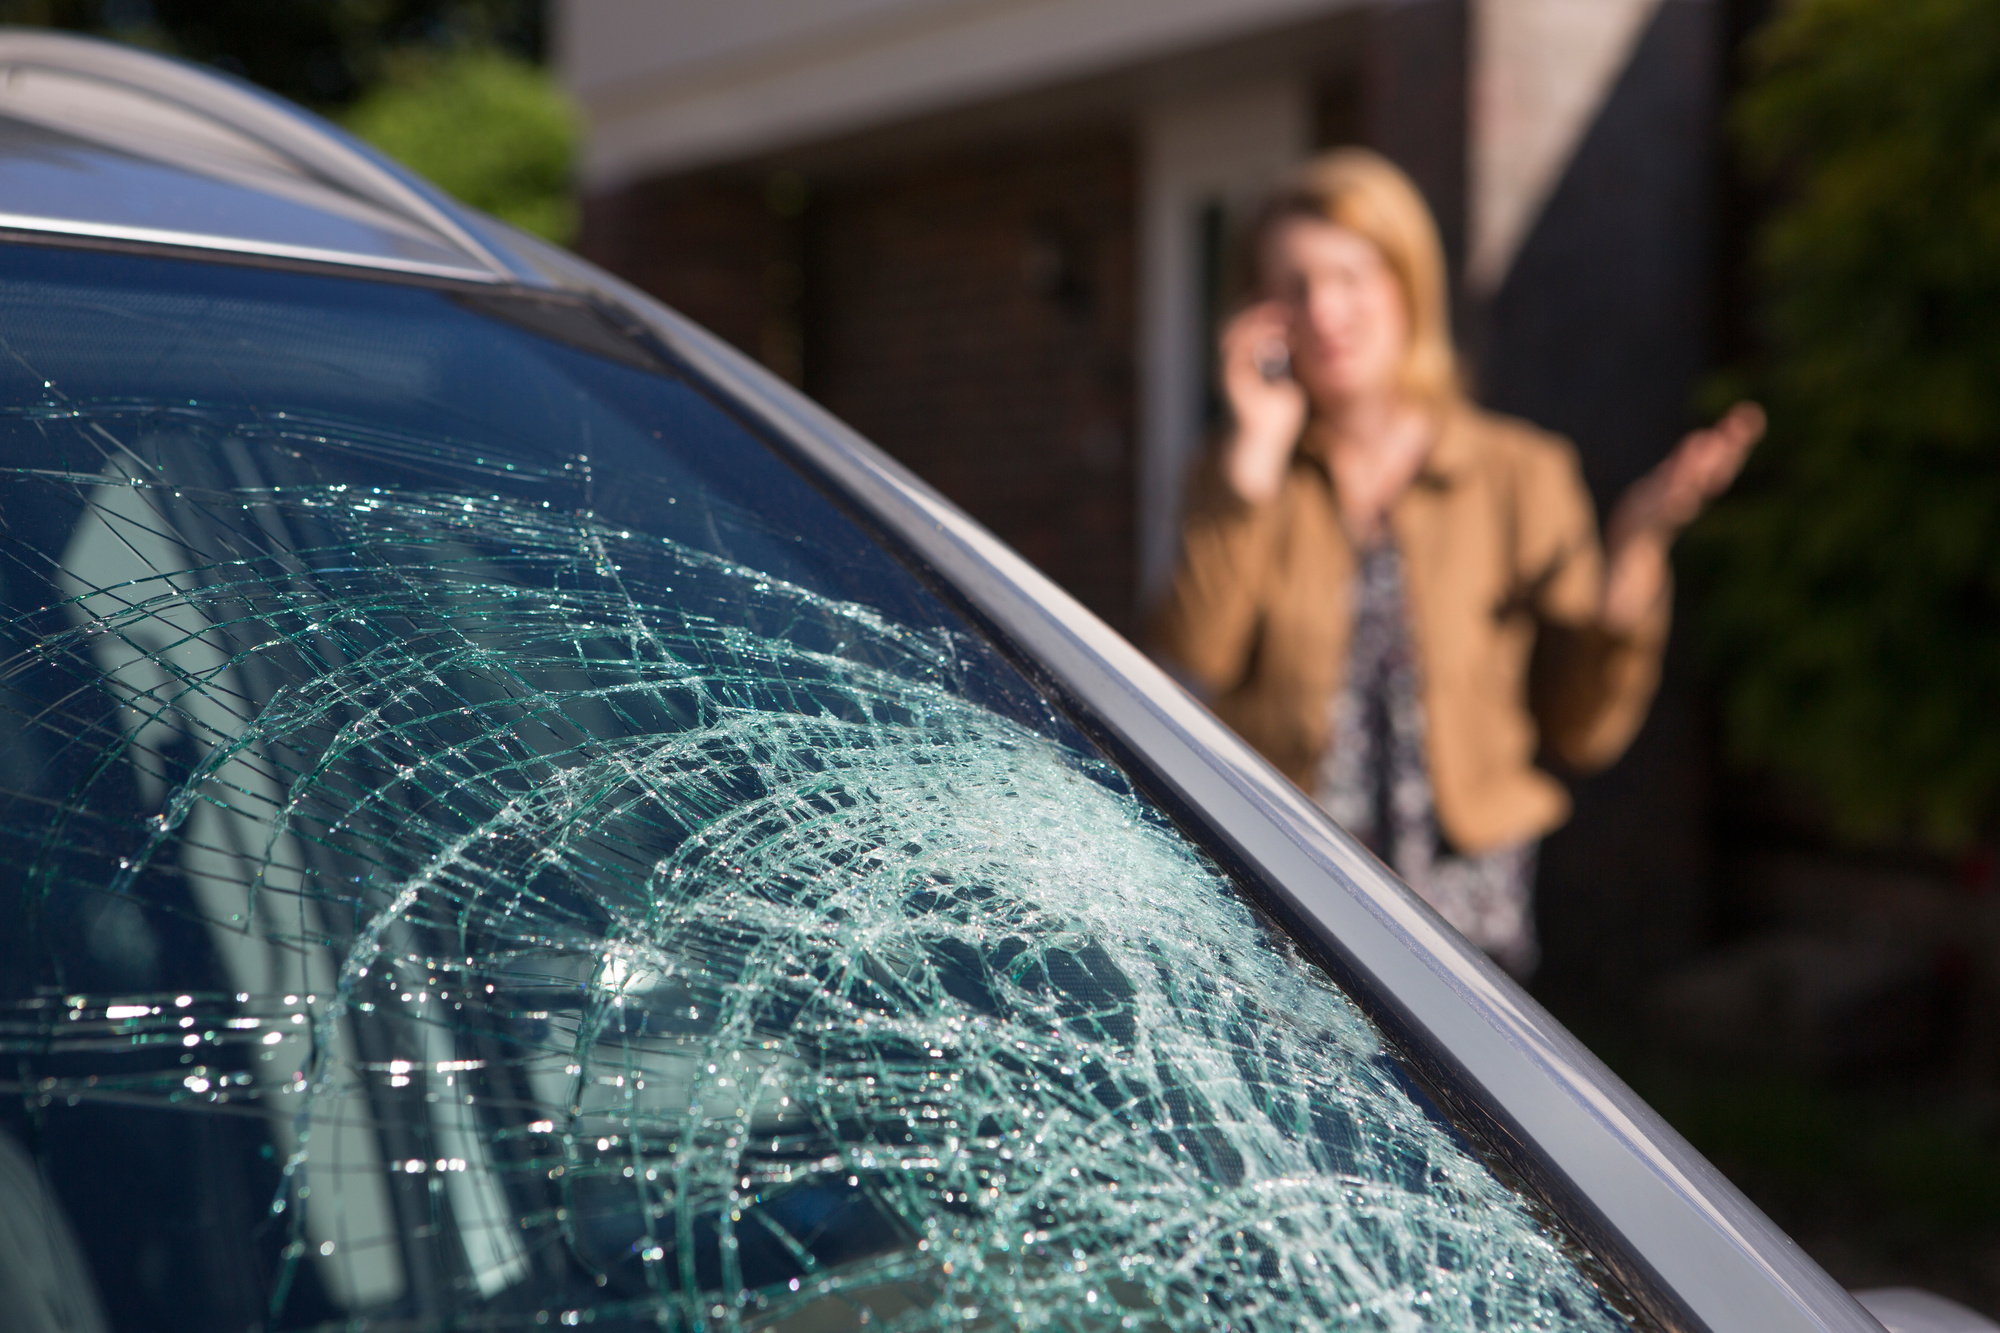 cracked windshield repair